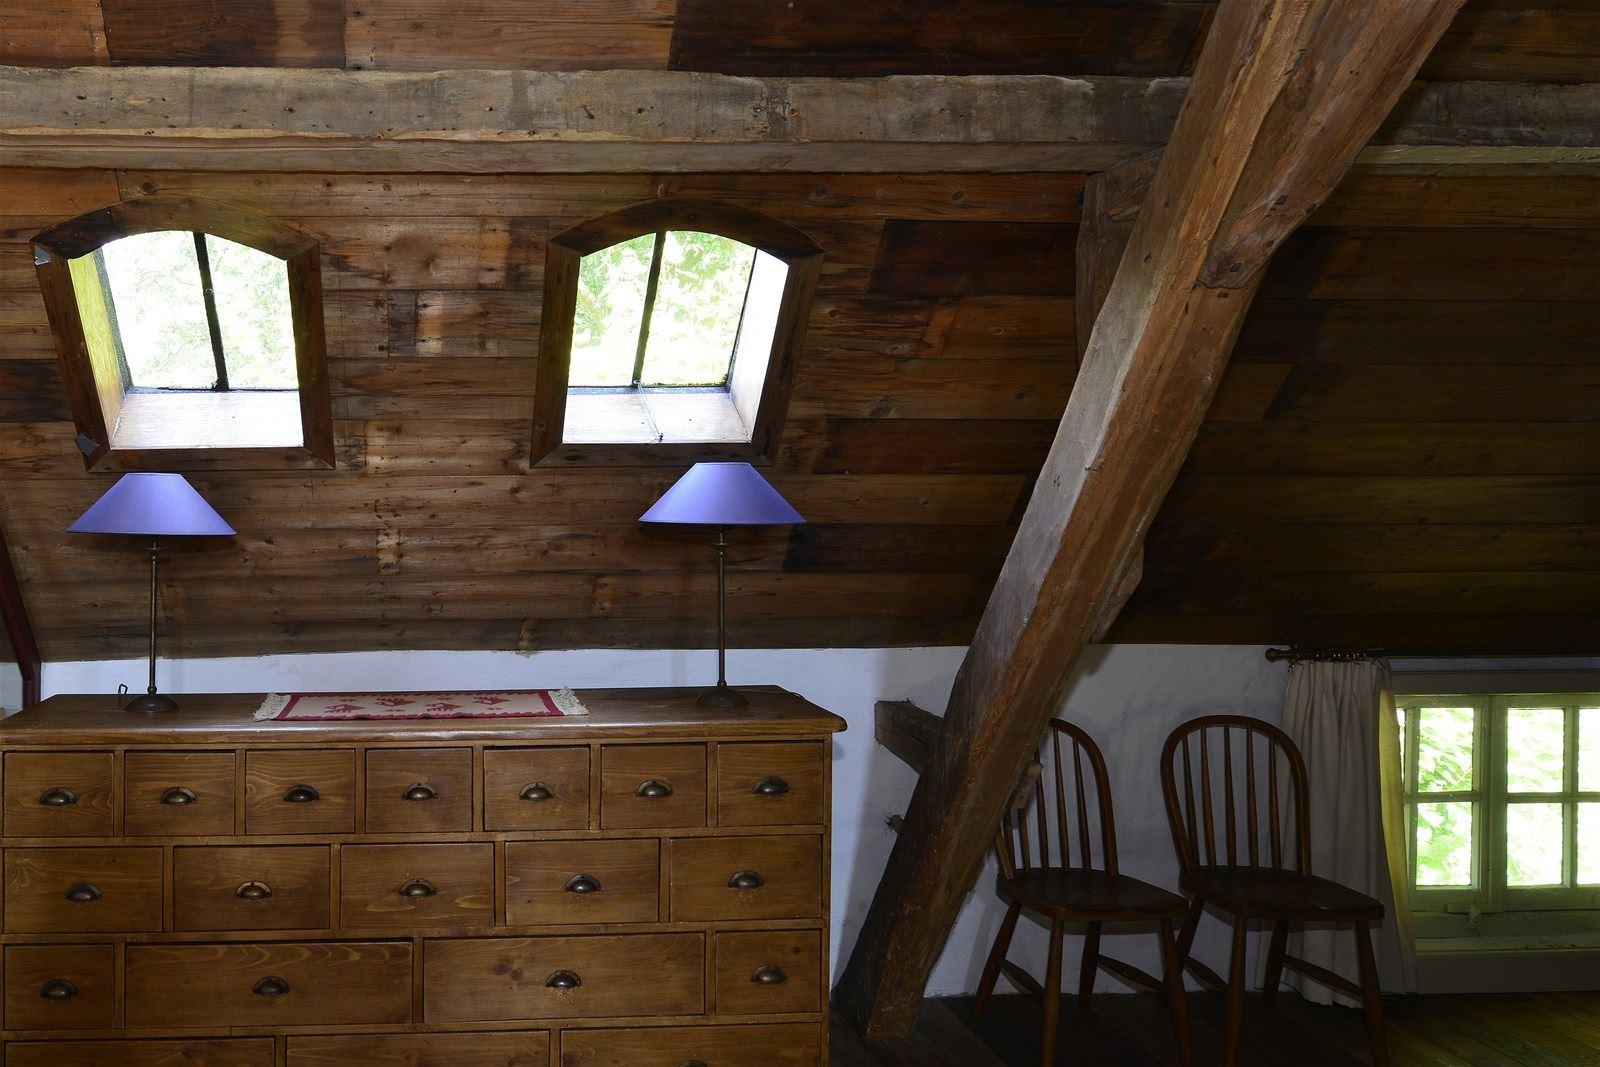 Huis te koop: kerklaan 3 5317 kz nederhemert [funda]